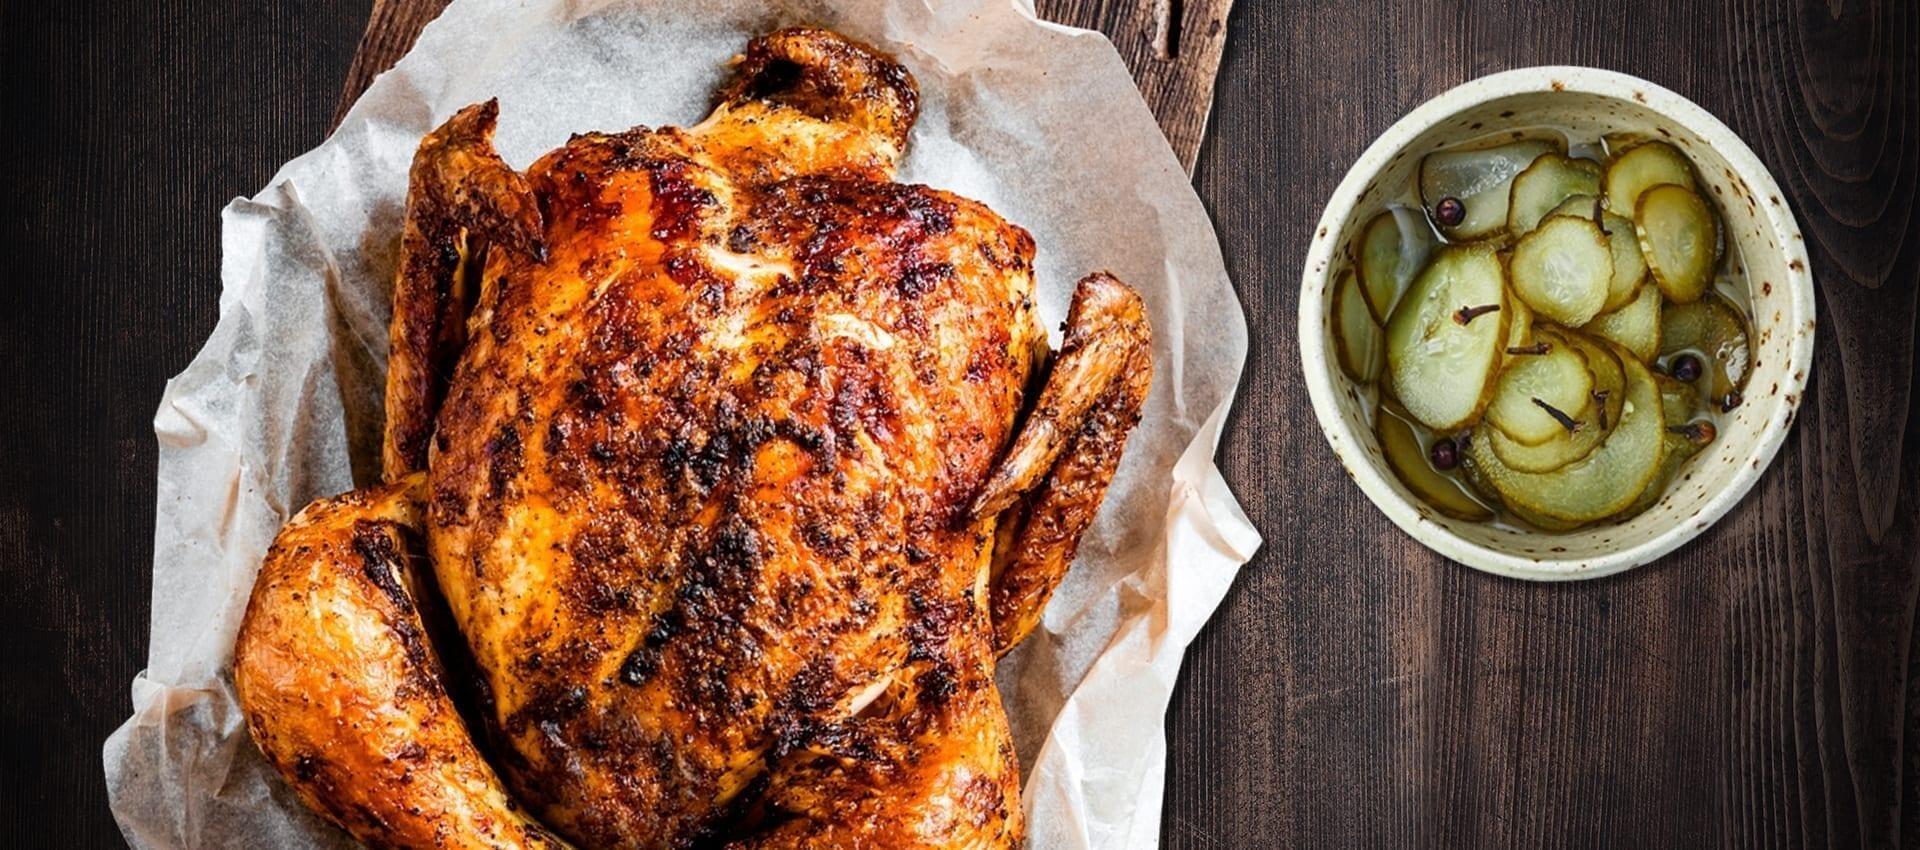 Mamarisavut kylling stegt i ovnen med agurkesalat som forslag til agurkesalat